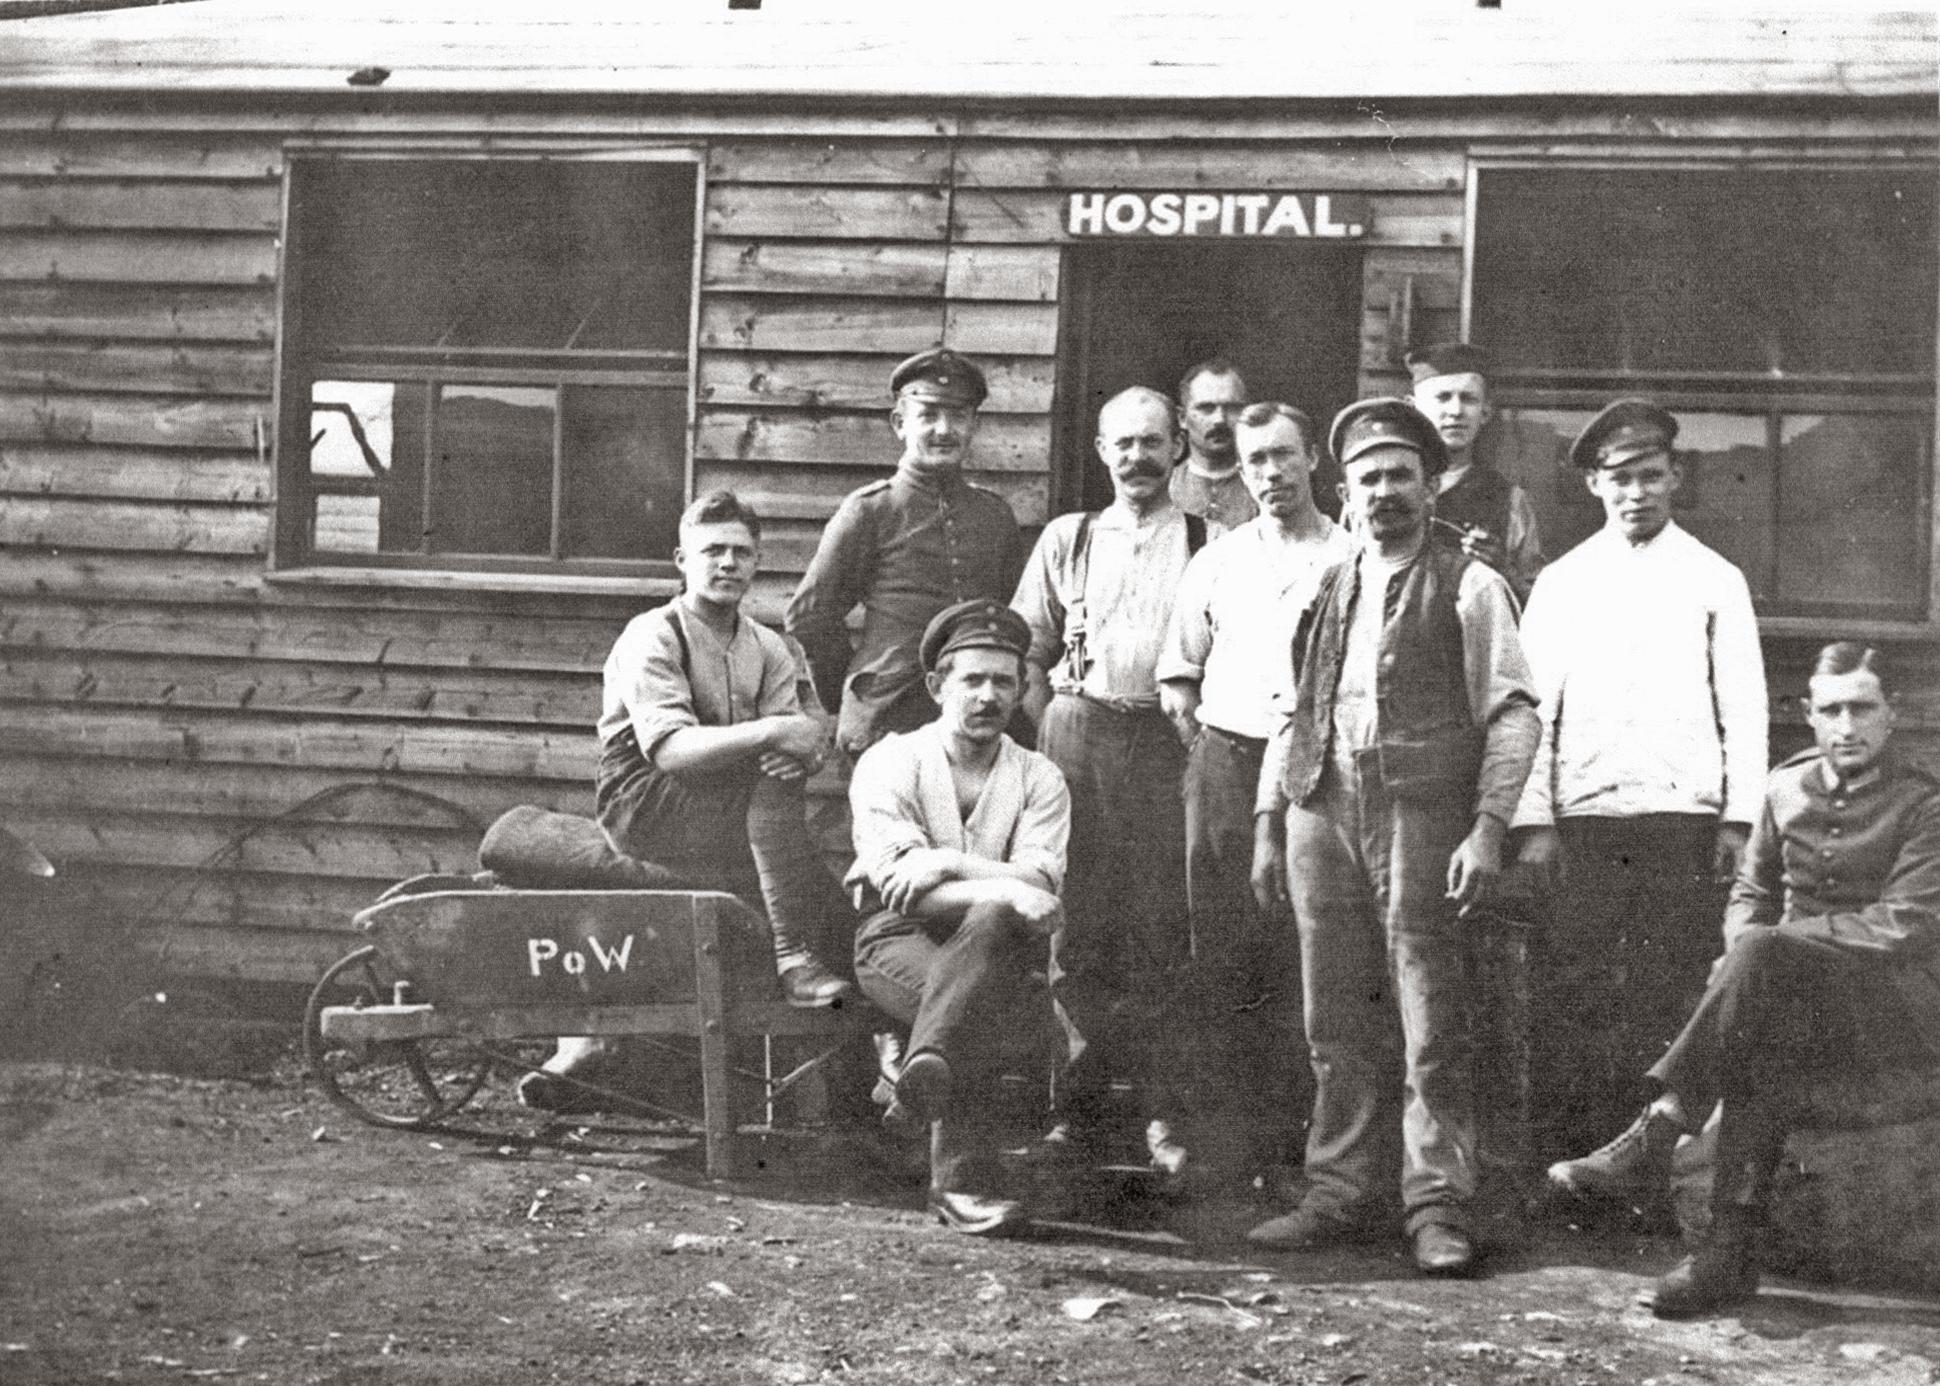 German Prisoners of War outside hospital - Raikeswood Camp, Skipton